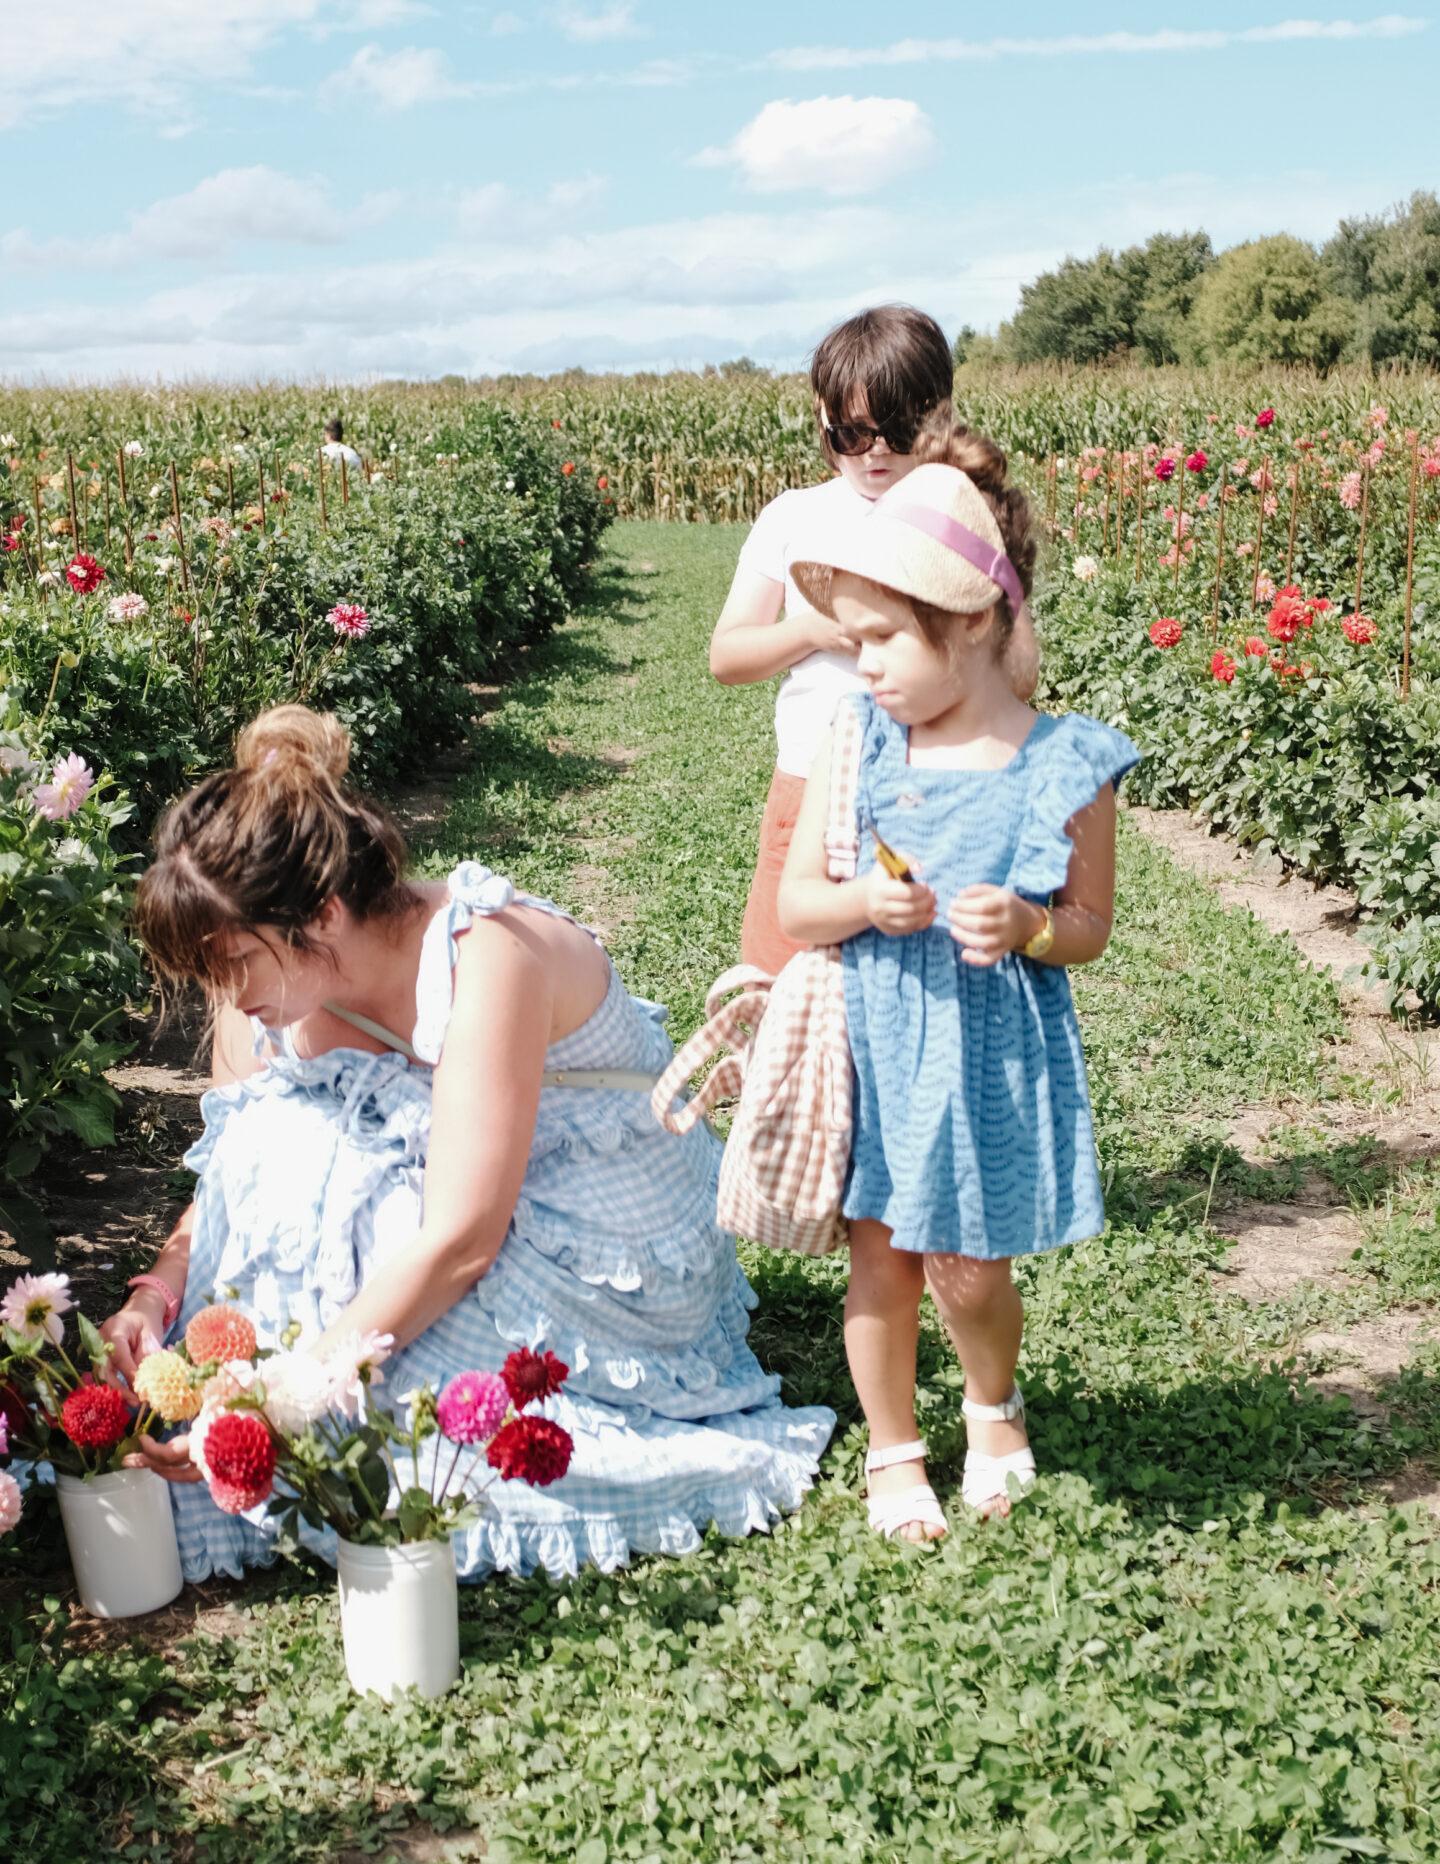 Flower field moment